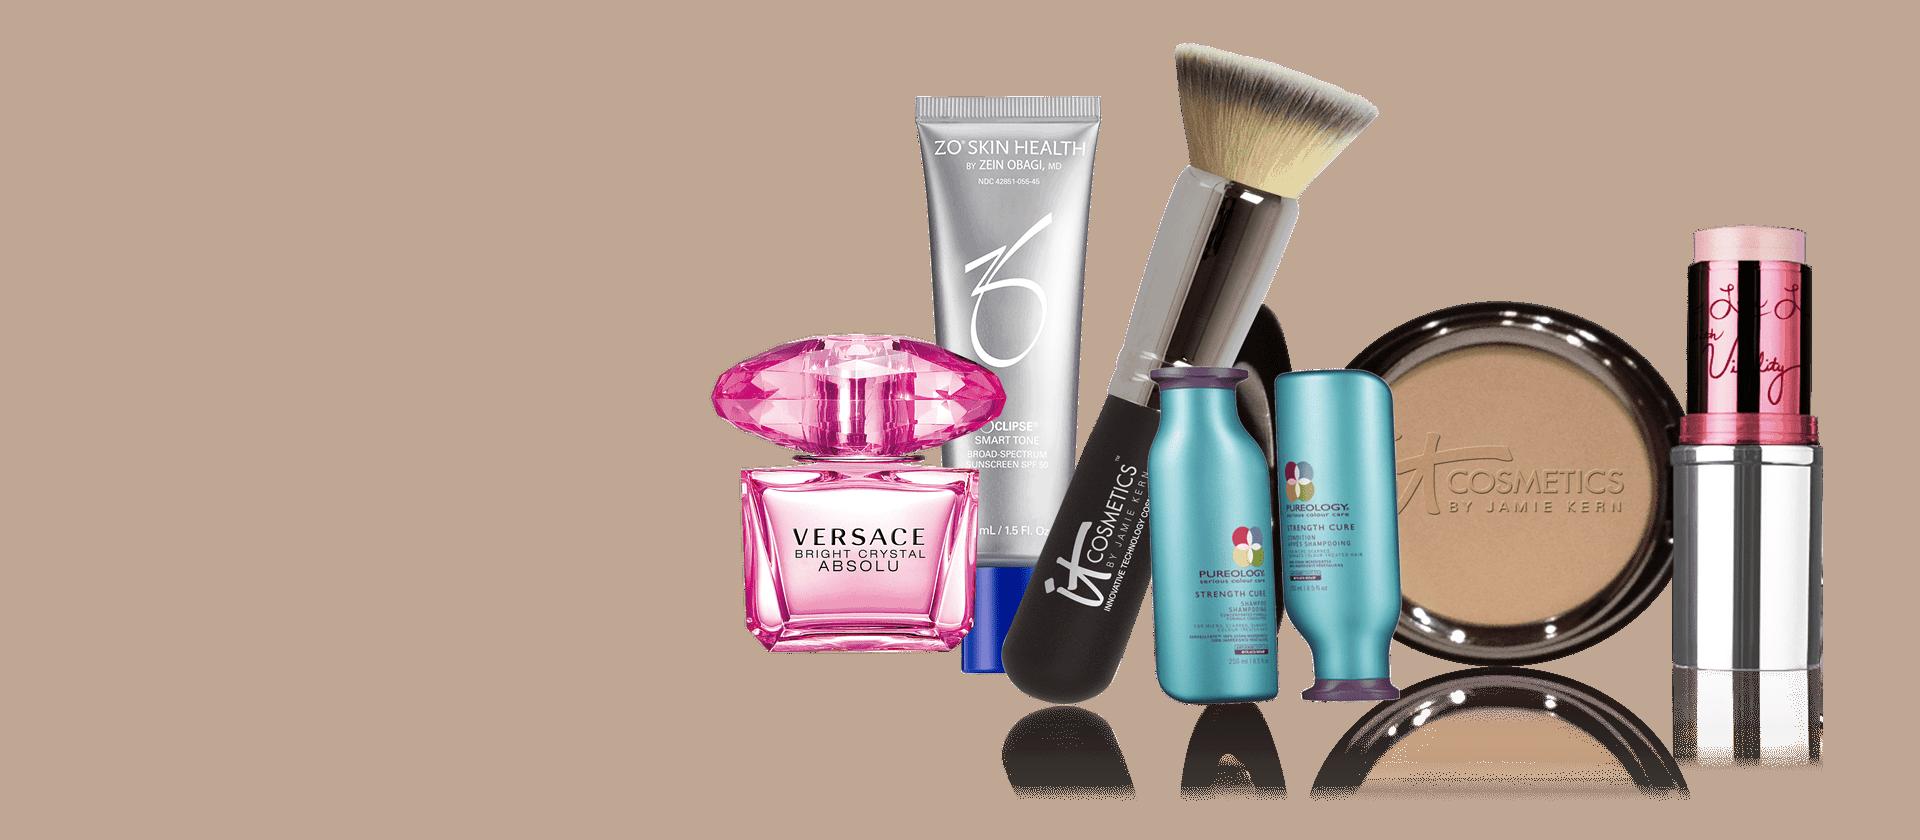 fragrances and shampoo wholesale - purefina Fragrances and Shampoo Wholesale – Purefina slide purefina head to toes